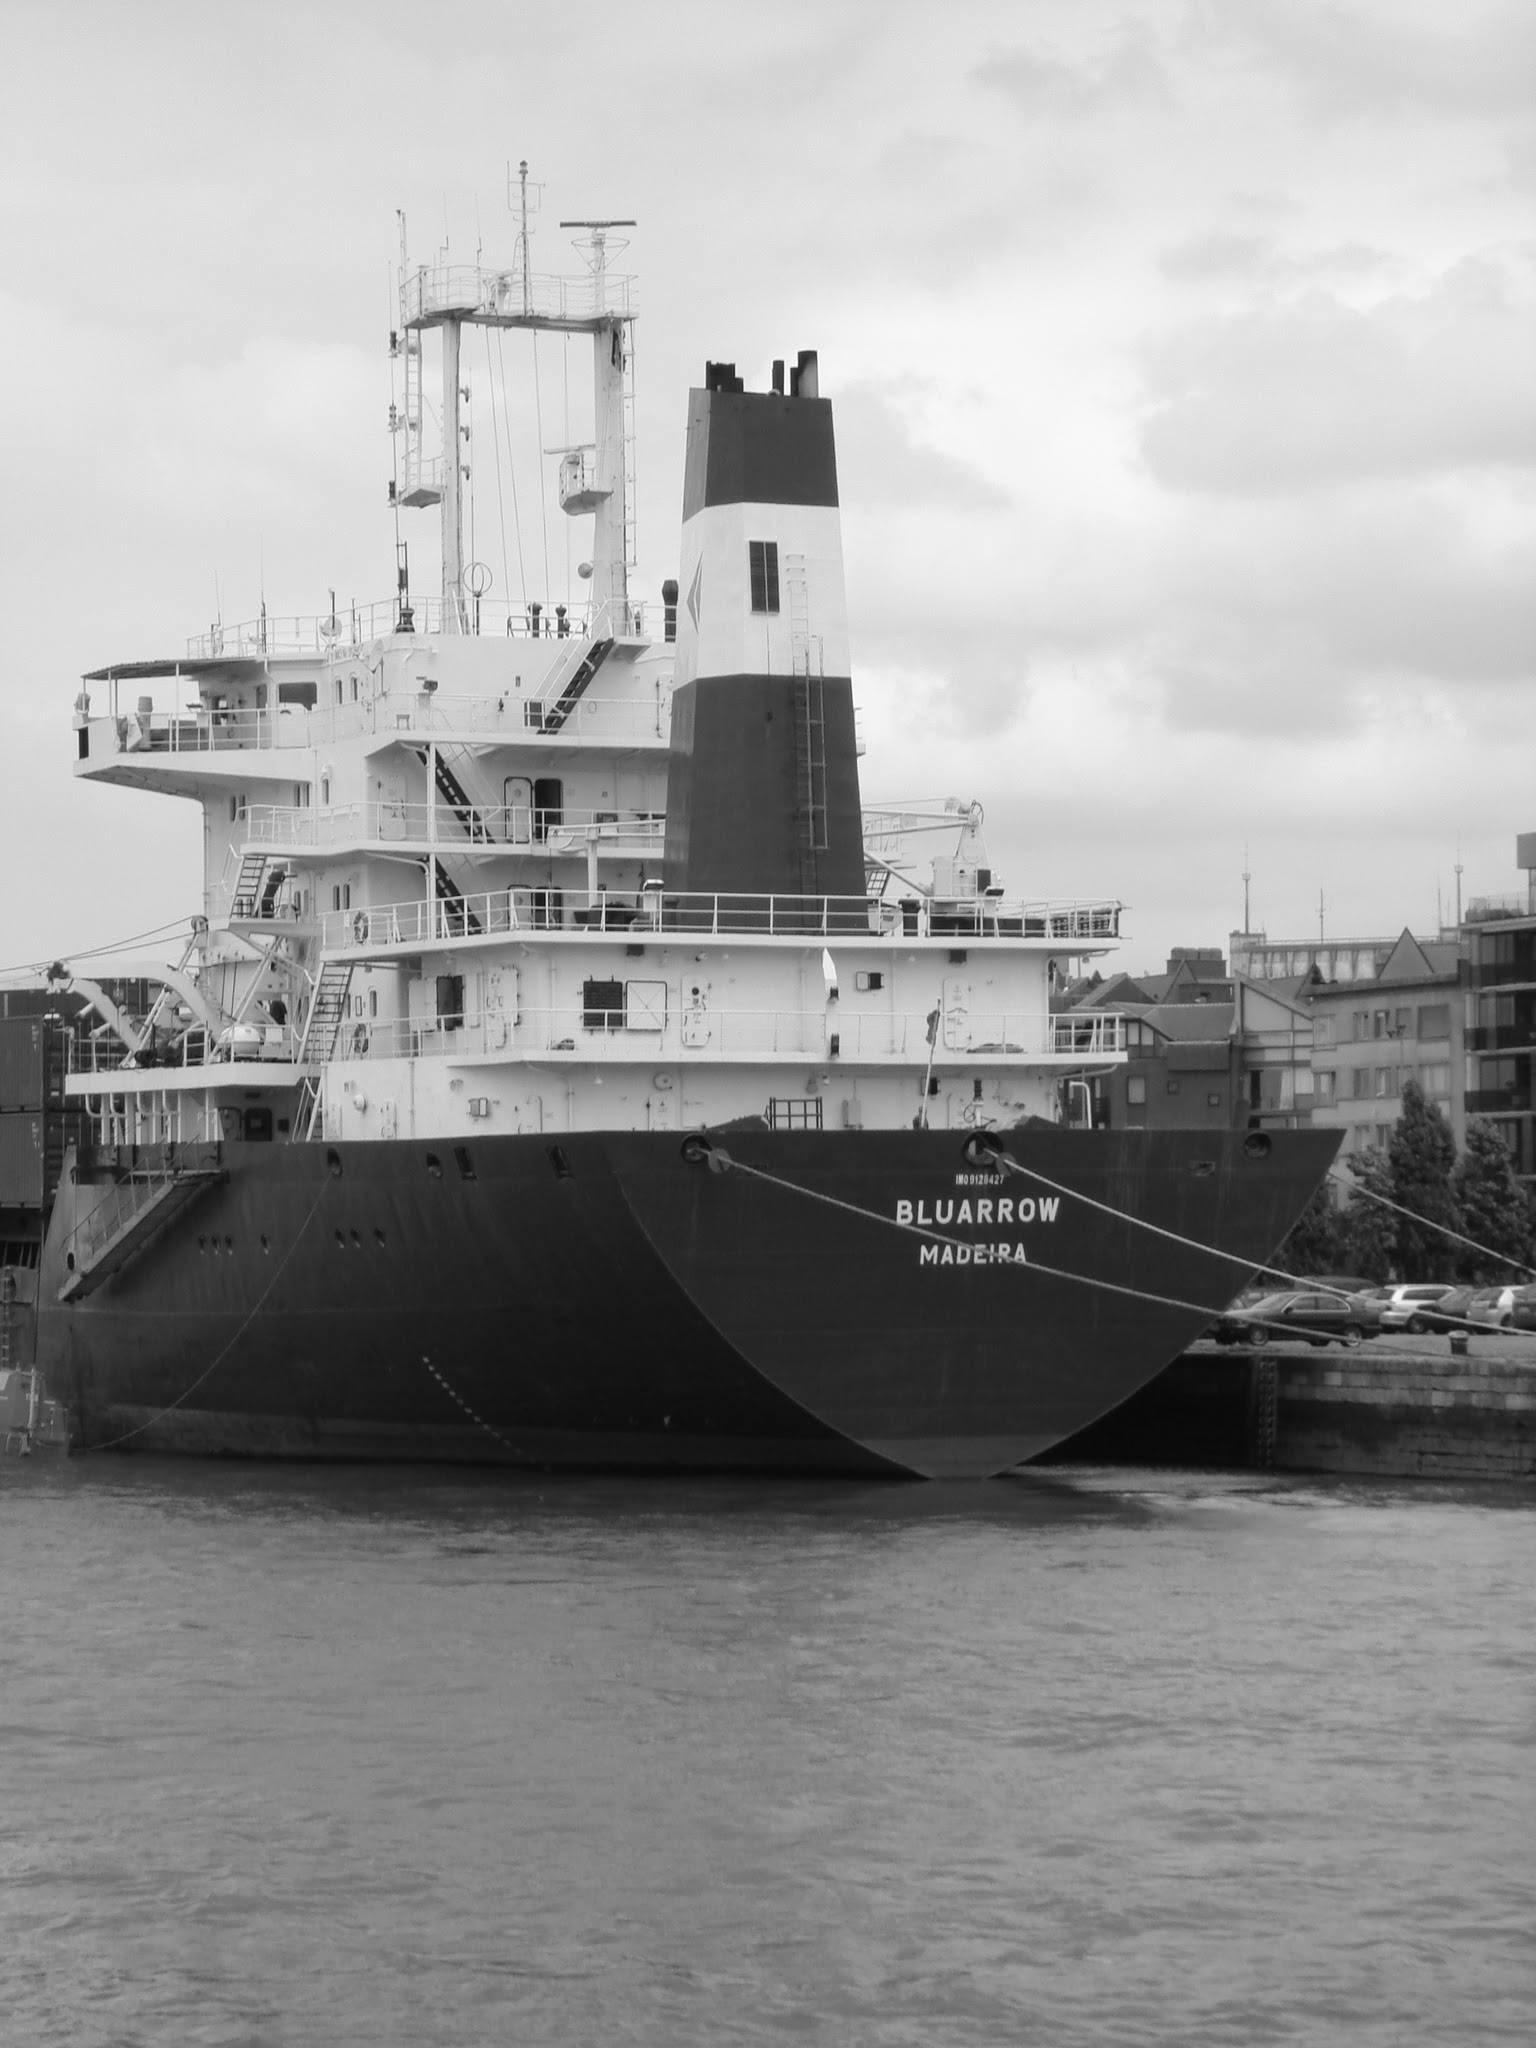 Antwerp, Belgium port of Antwerp, a boat from Portugal by Rosario Di Rubbo